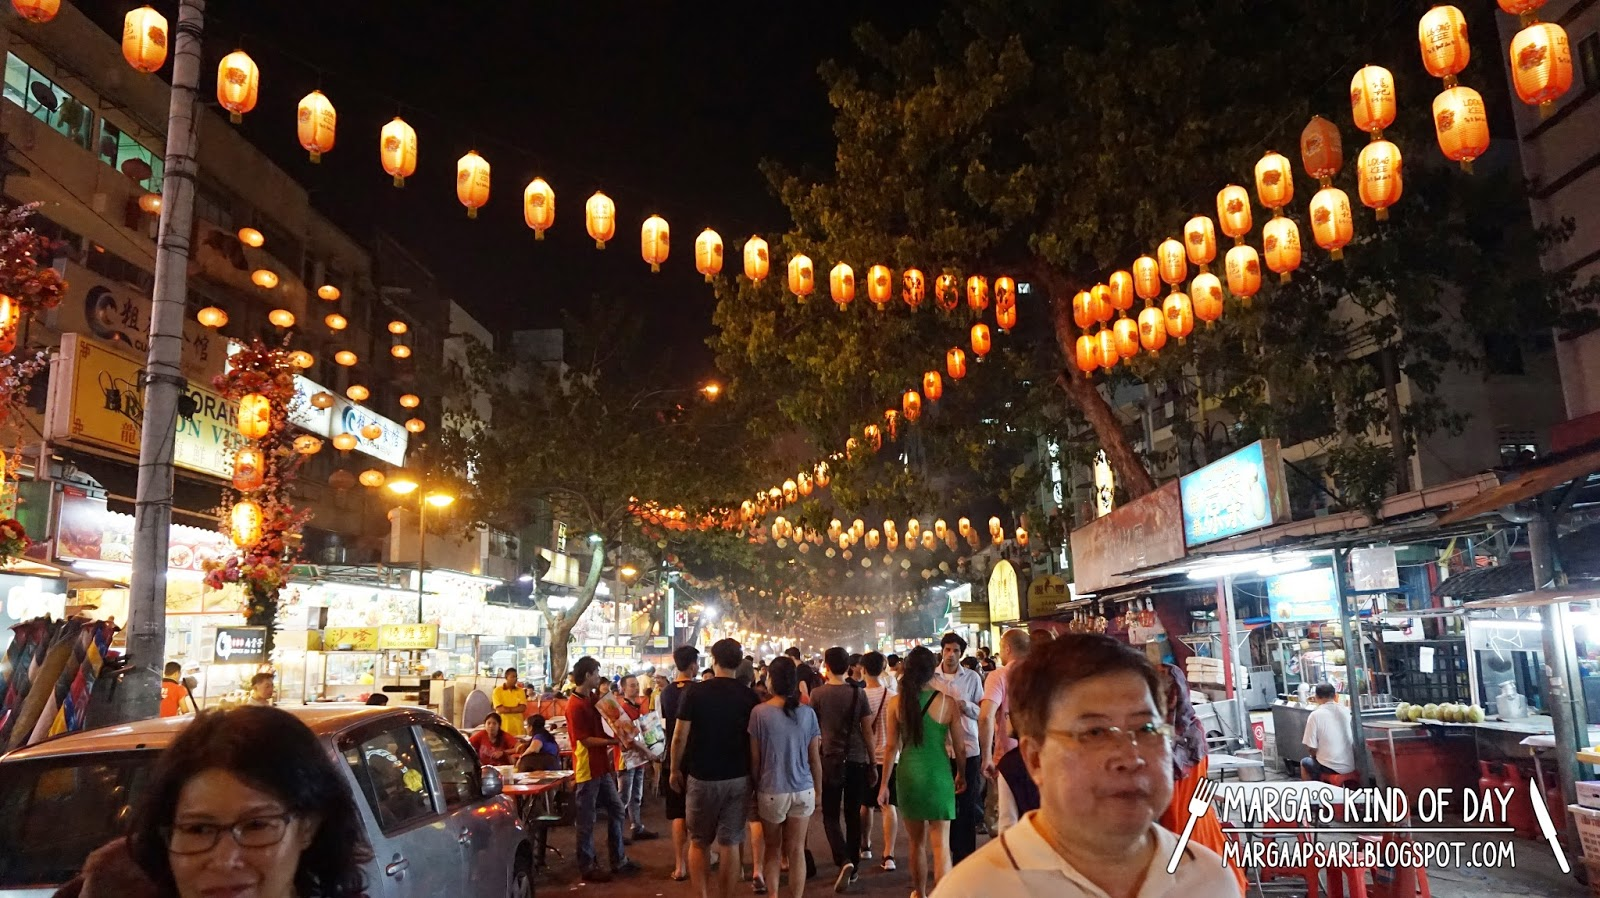 Wisata kuliner di Jalan Alor Kuala Lumpur